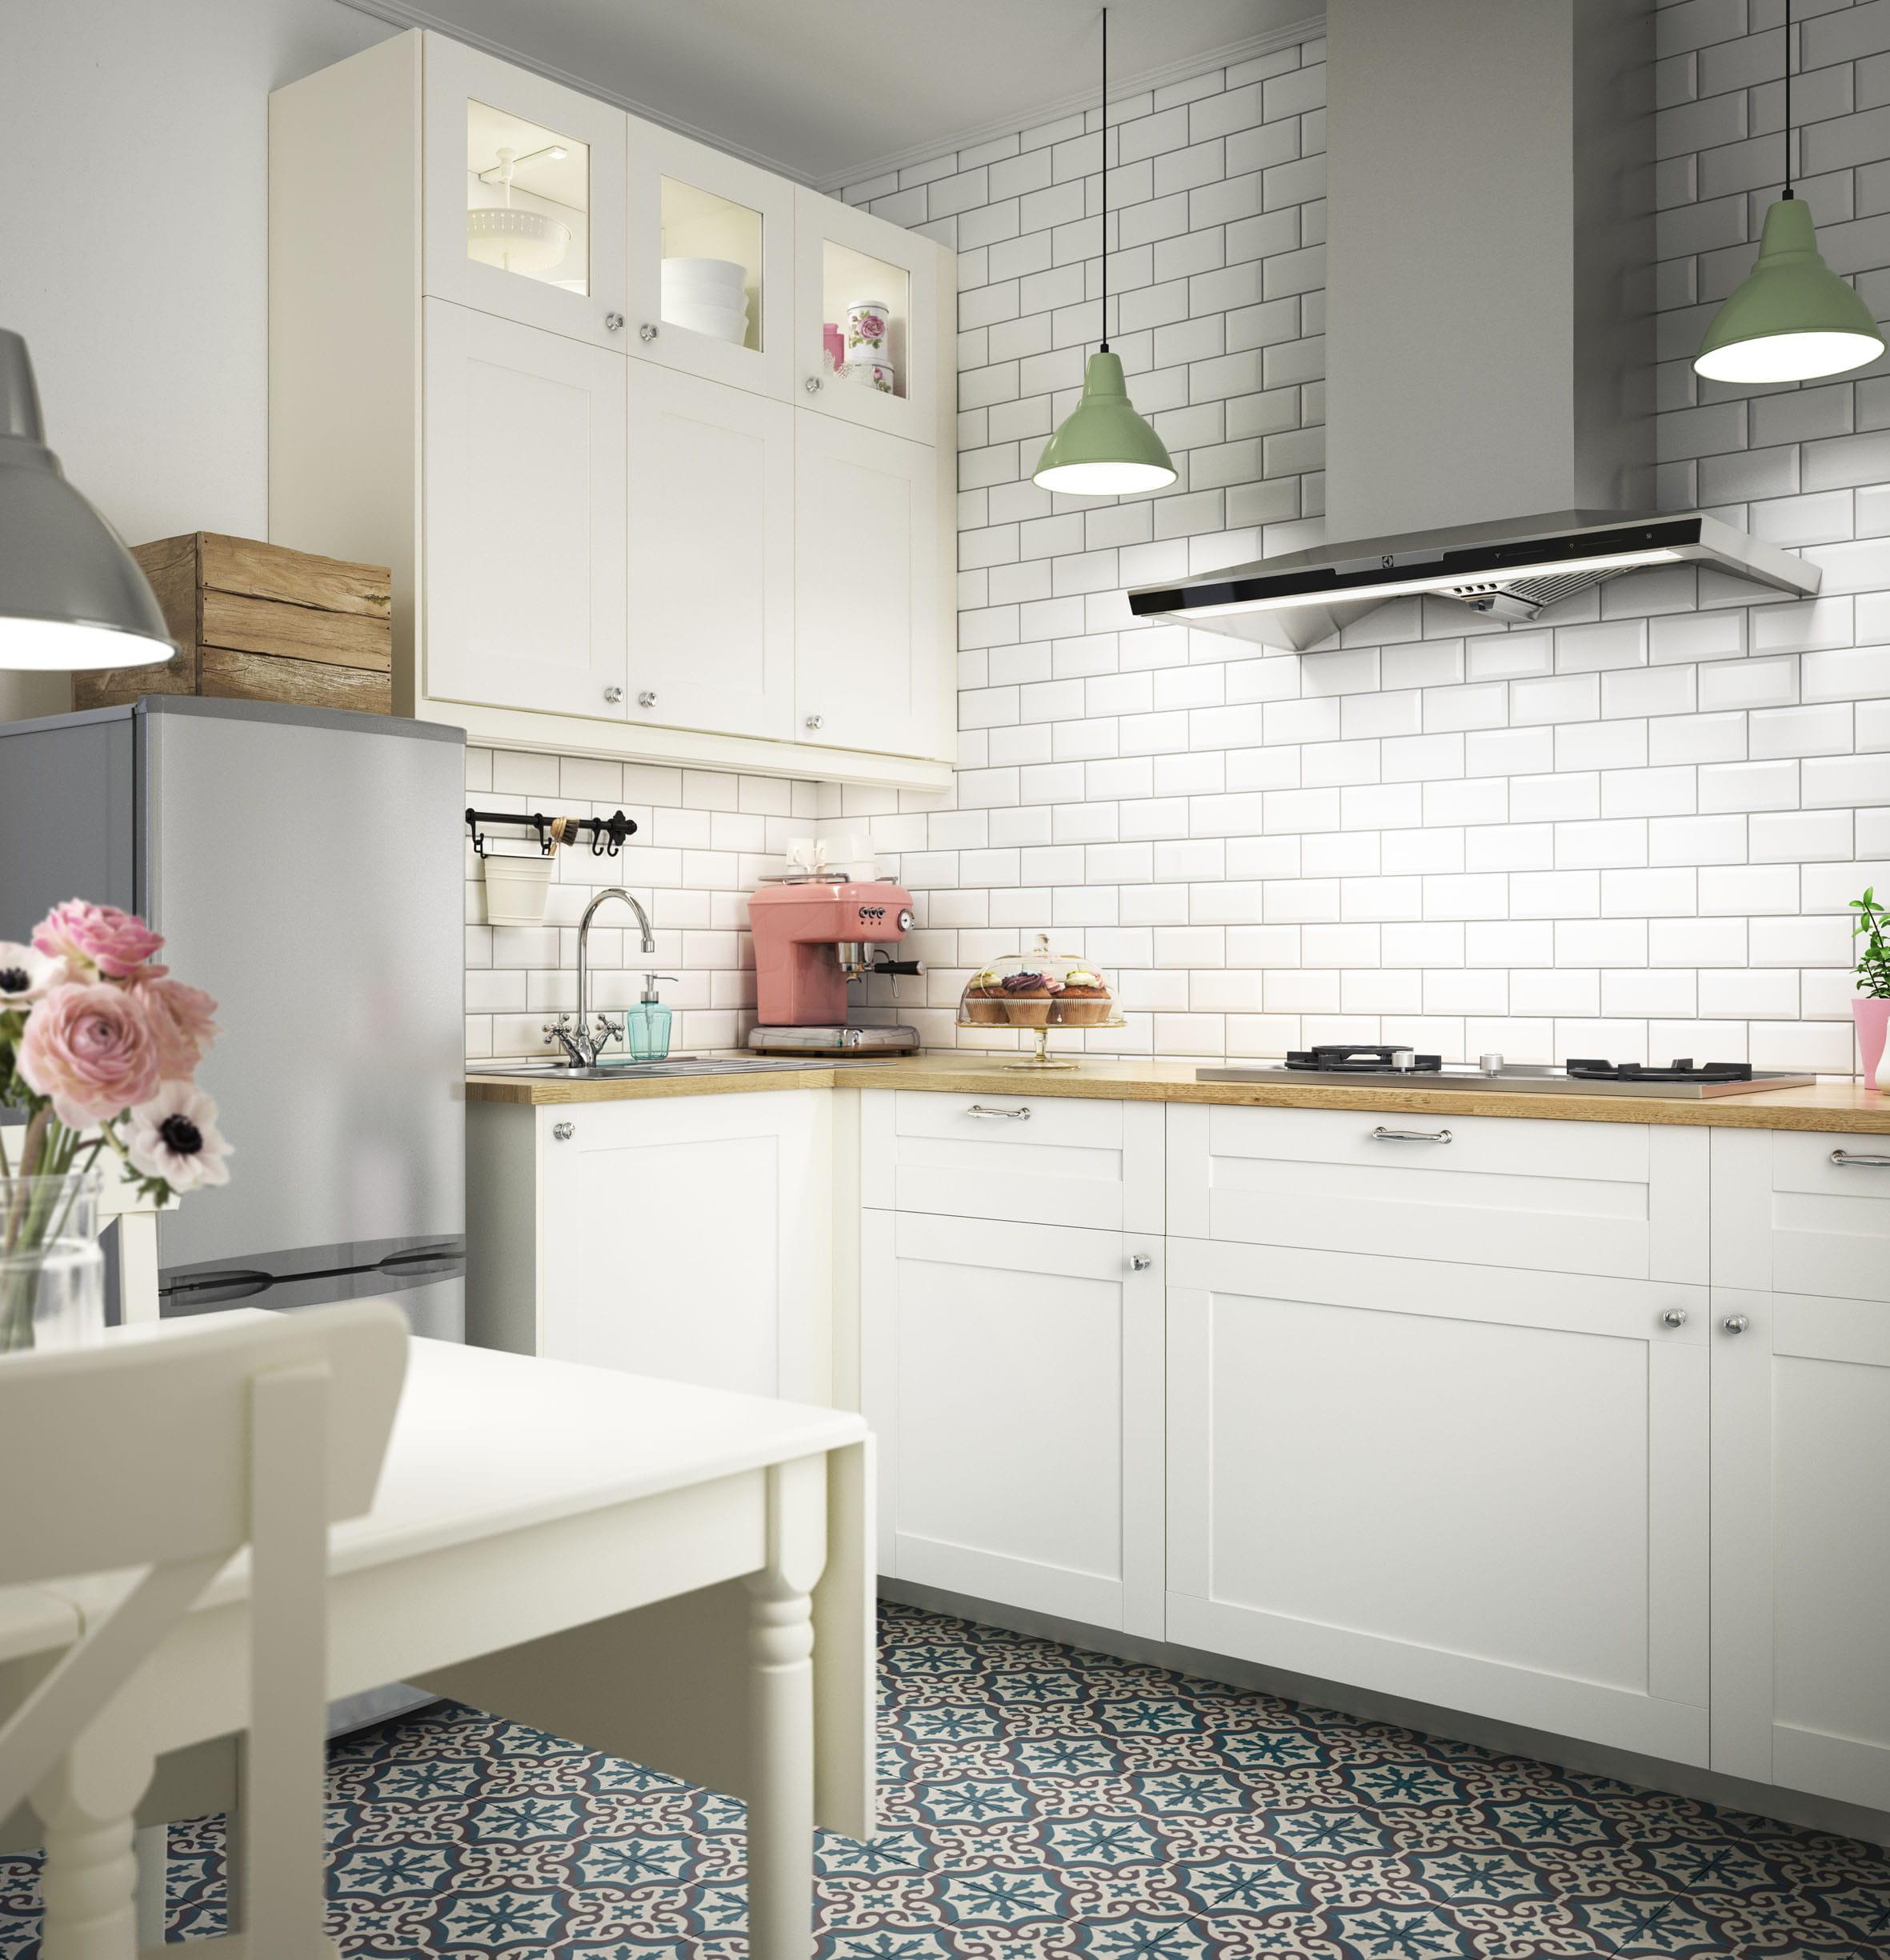 Carrelage Mural Cuisine Ikea metod f rvara lt haut tablettes 2tiroirs 4ptes blanc